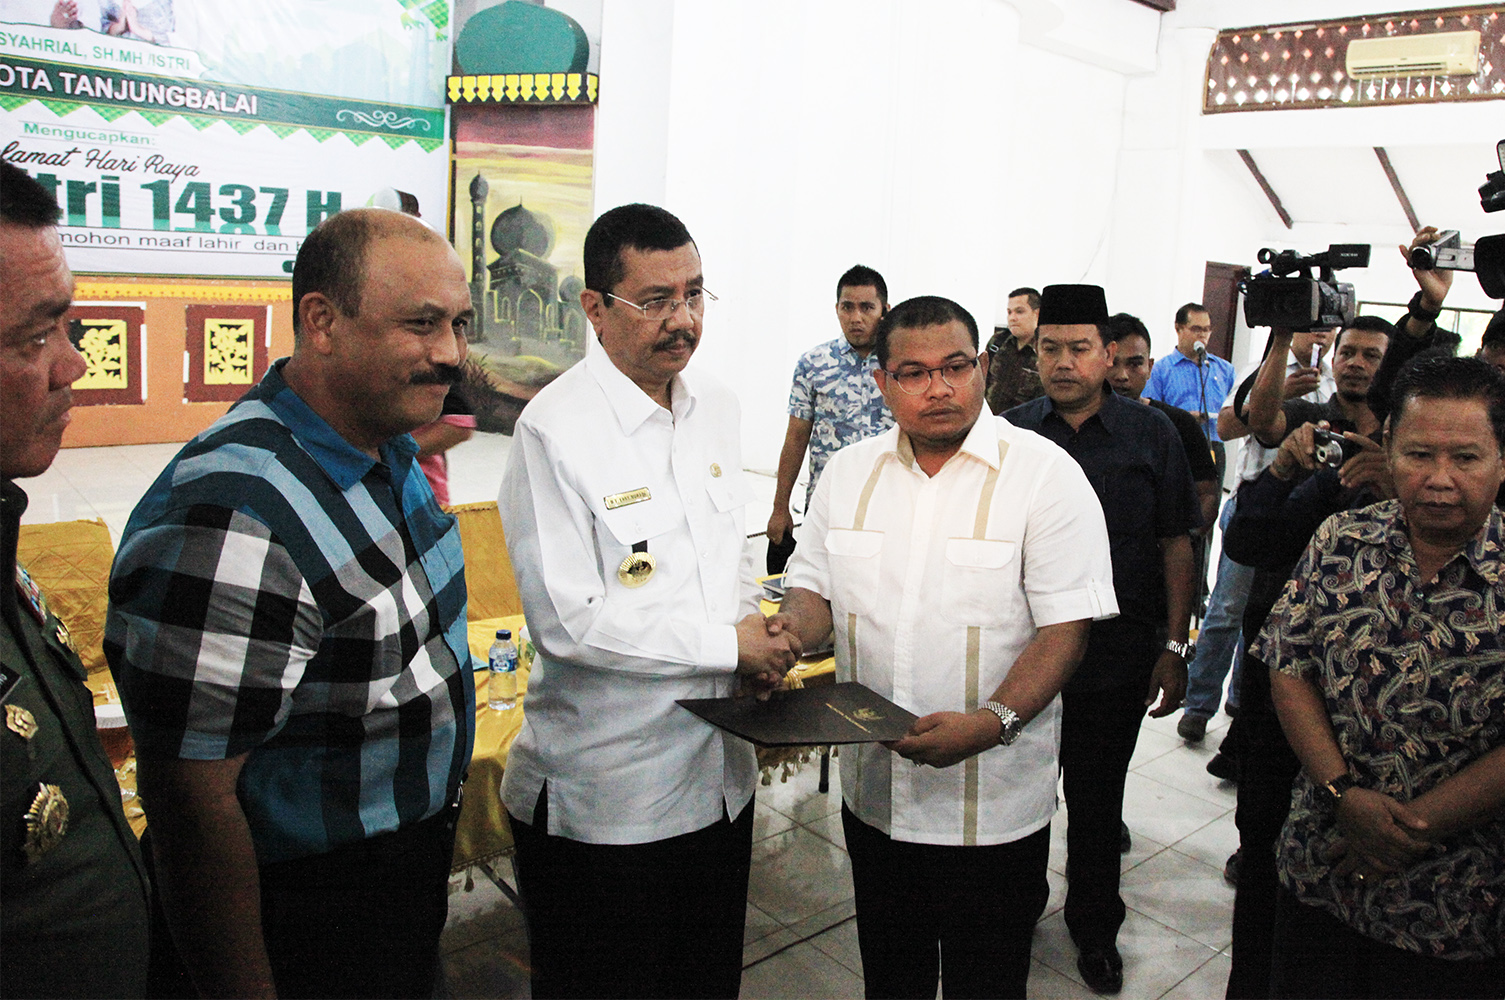 Warga Tanjung Balai Sudah Rukun Kompak Dan Damai Roda Kopi Bos By Ila Arifin Amr Perekonomian Normal